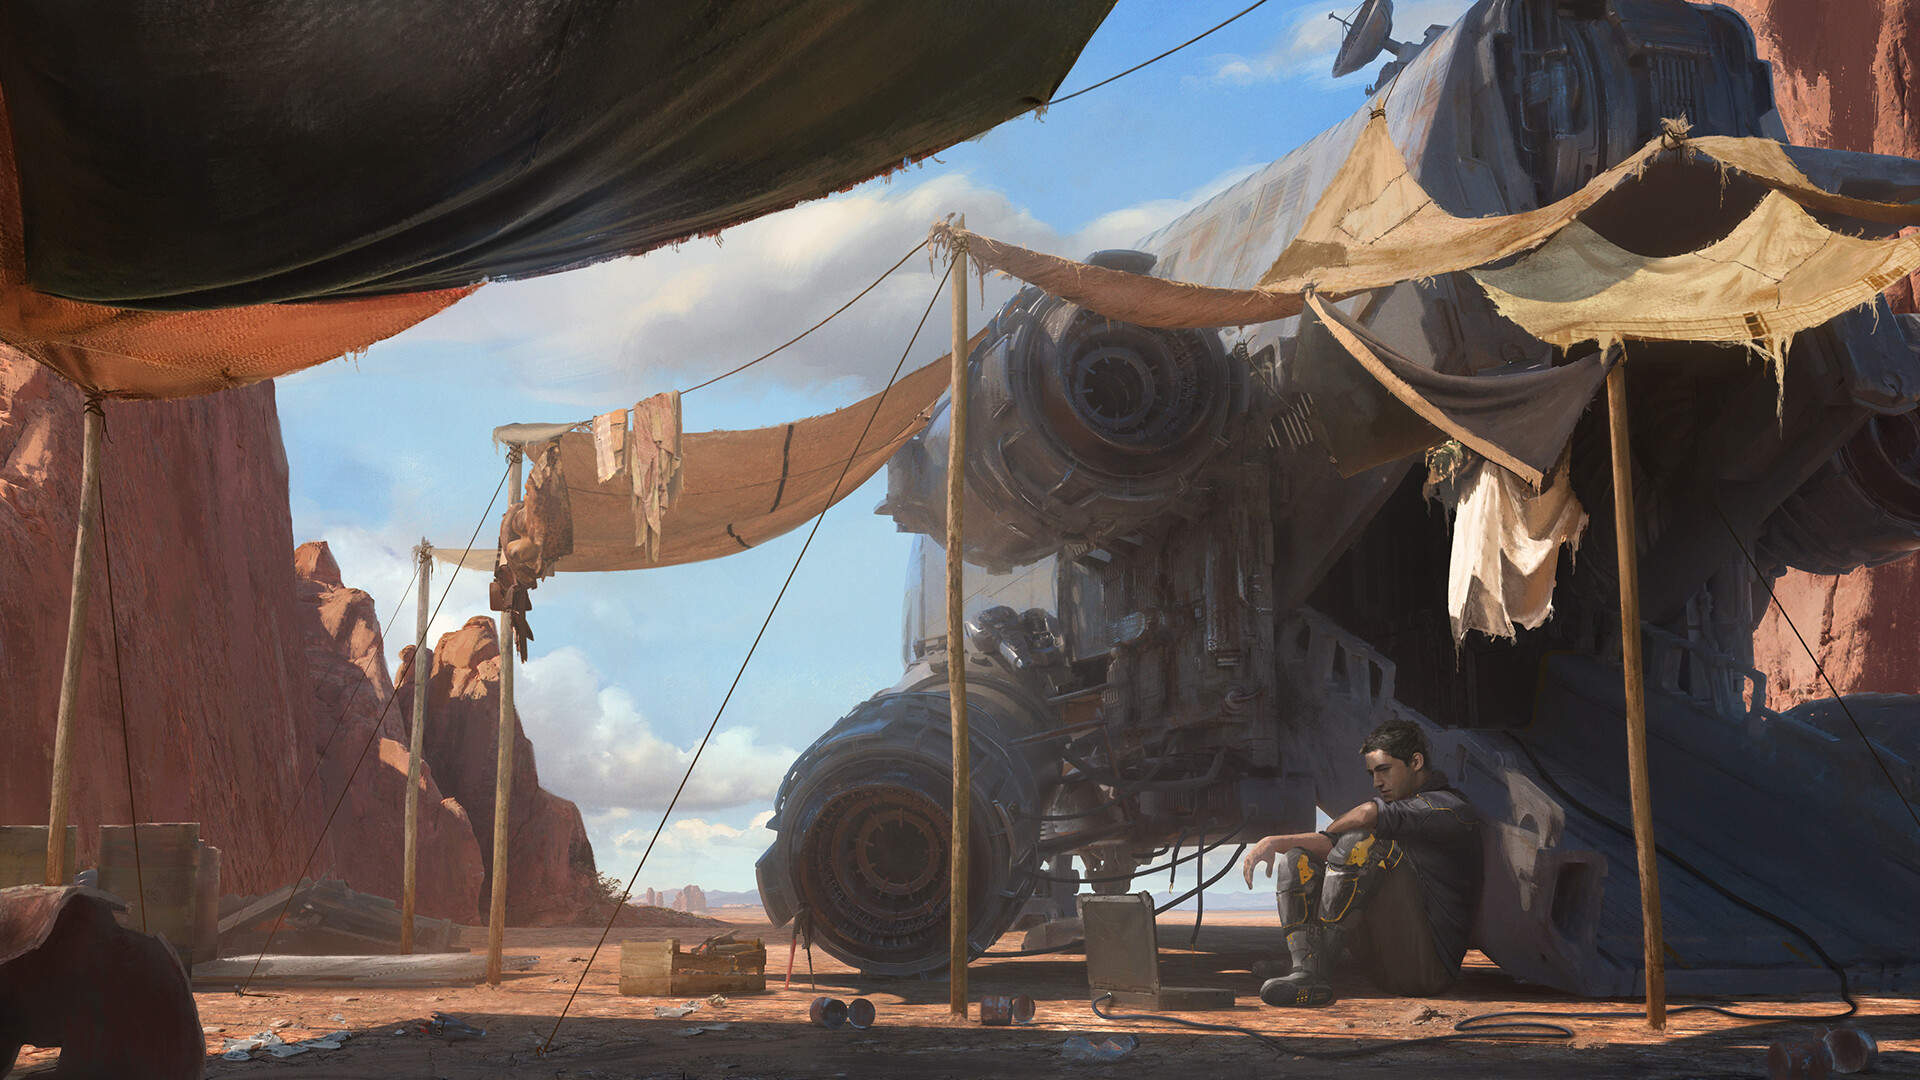 erik-halsey-shipwreck-008.jpg?1553973689